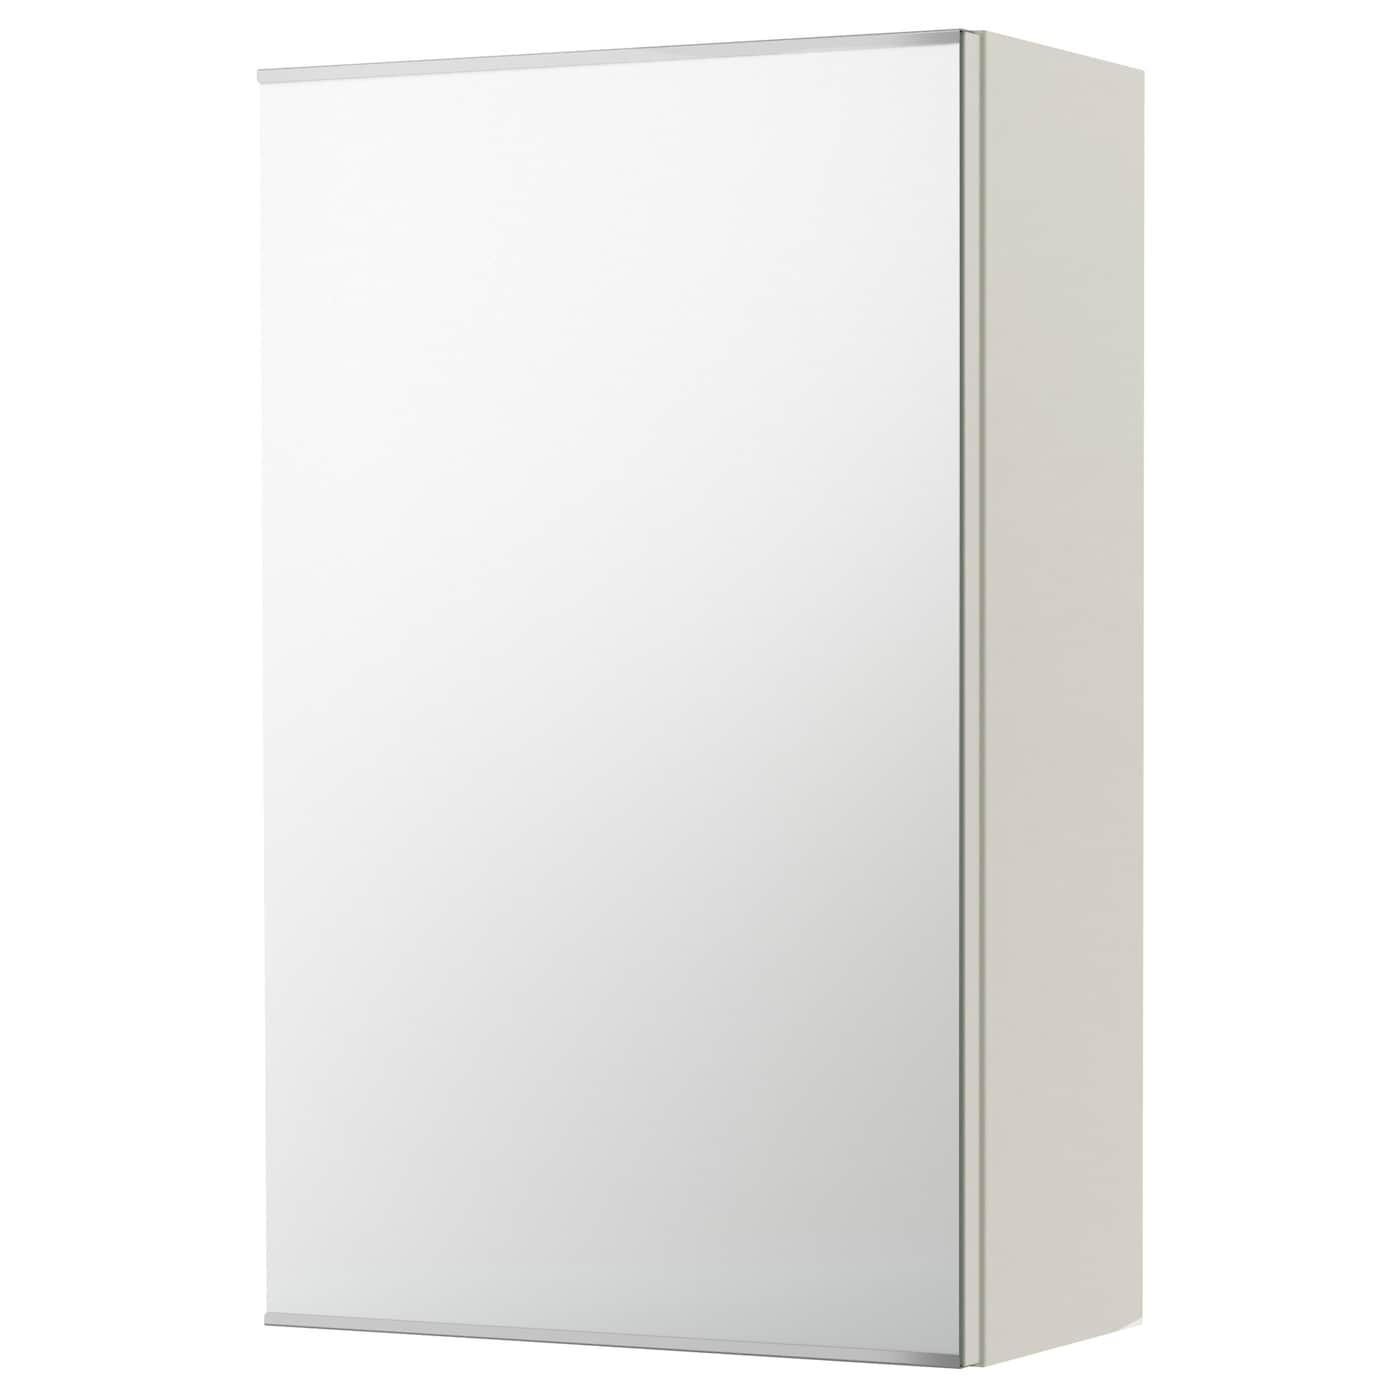 Lillången Armario Con Espejo 1 Puerta Blanco 40 X 21 X 64 Cm Ikea